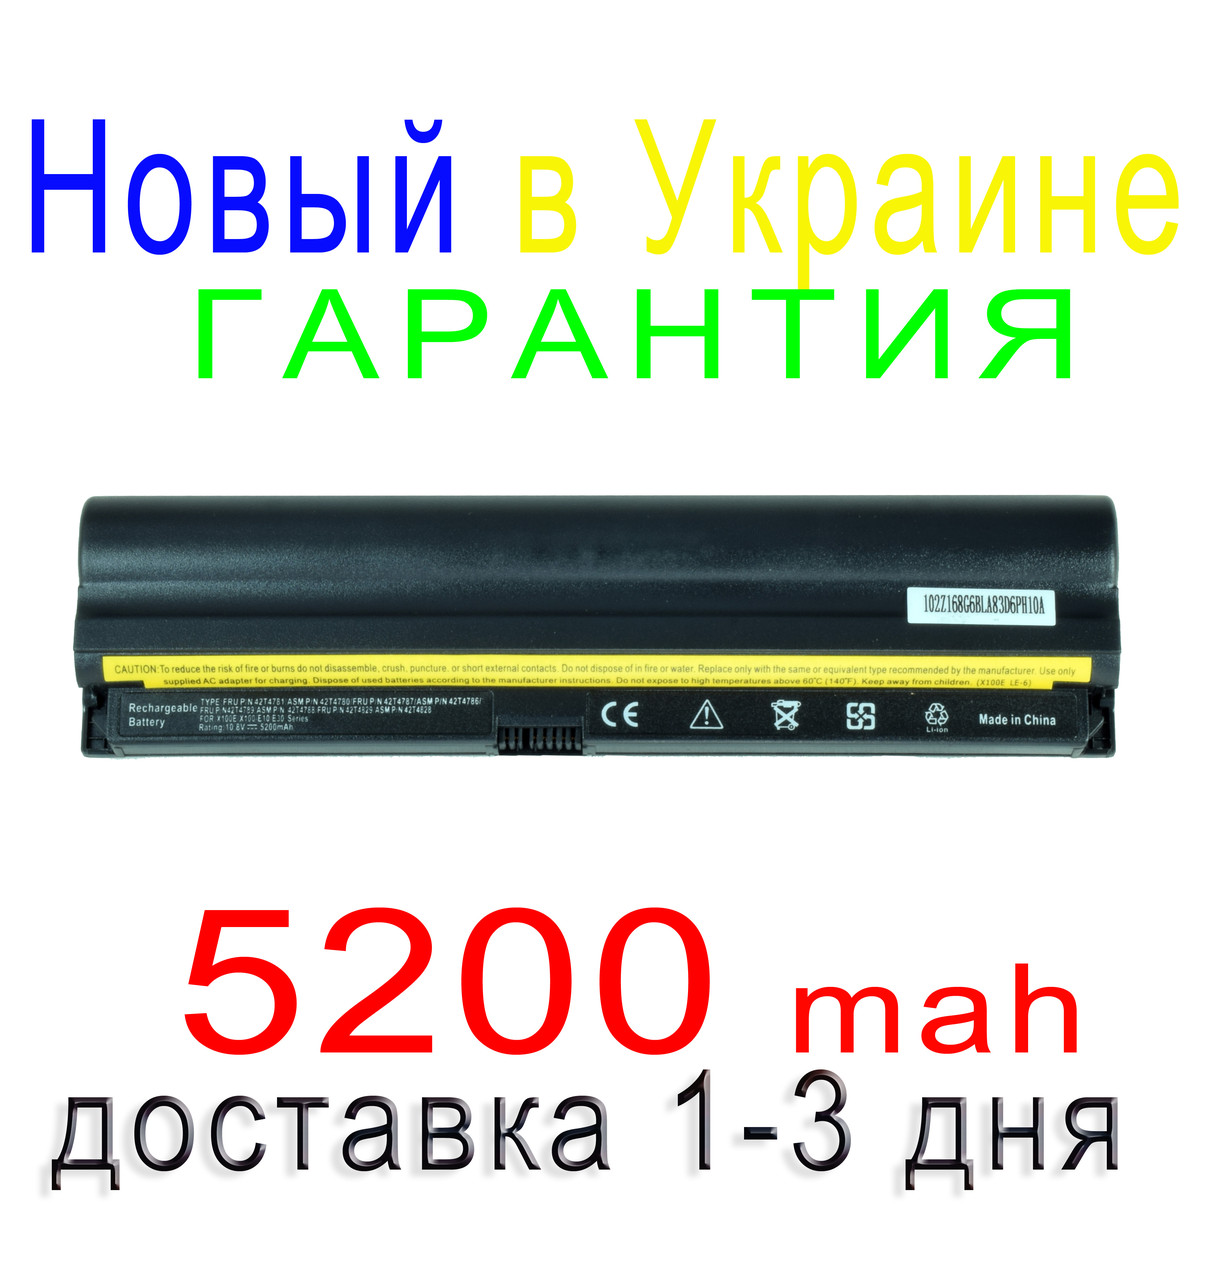 Аккумулятор батарея Lenovo 42T4829 42T4841 42T4843 42T4854 42T4855 42T4856 42T4889 42T4891 42T4895